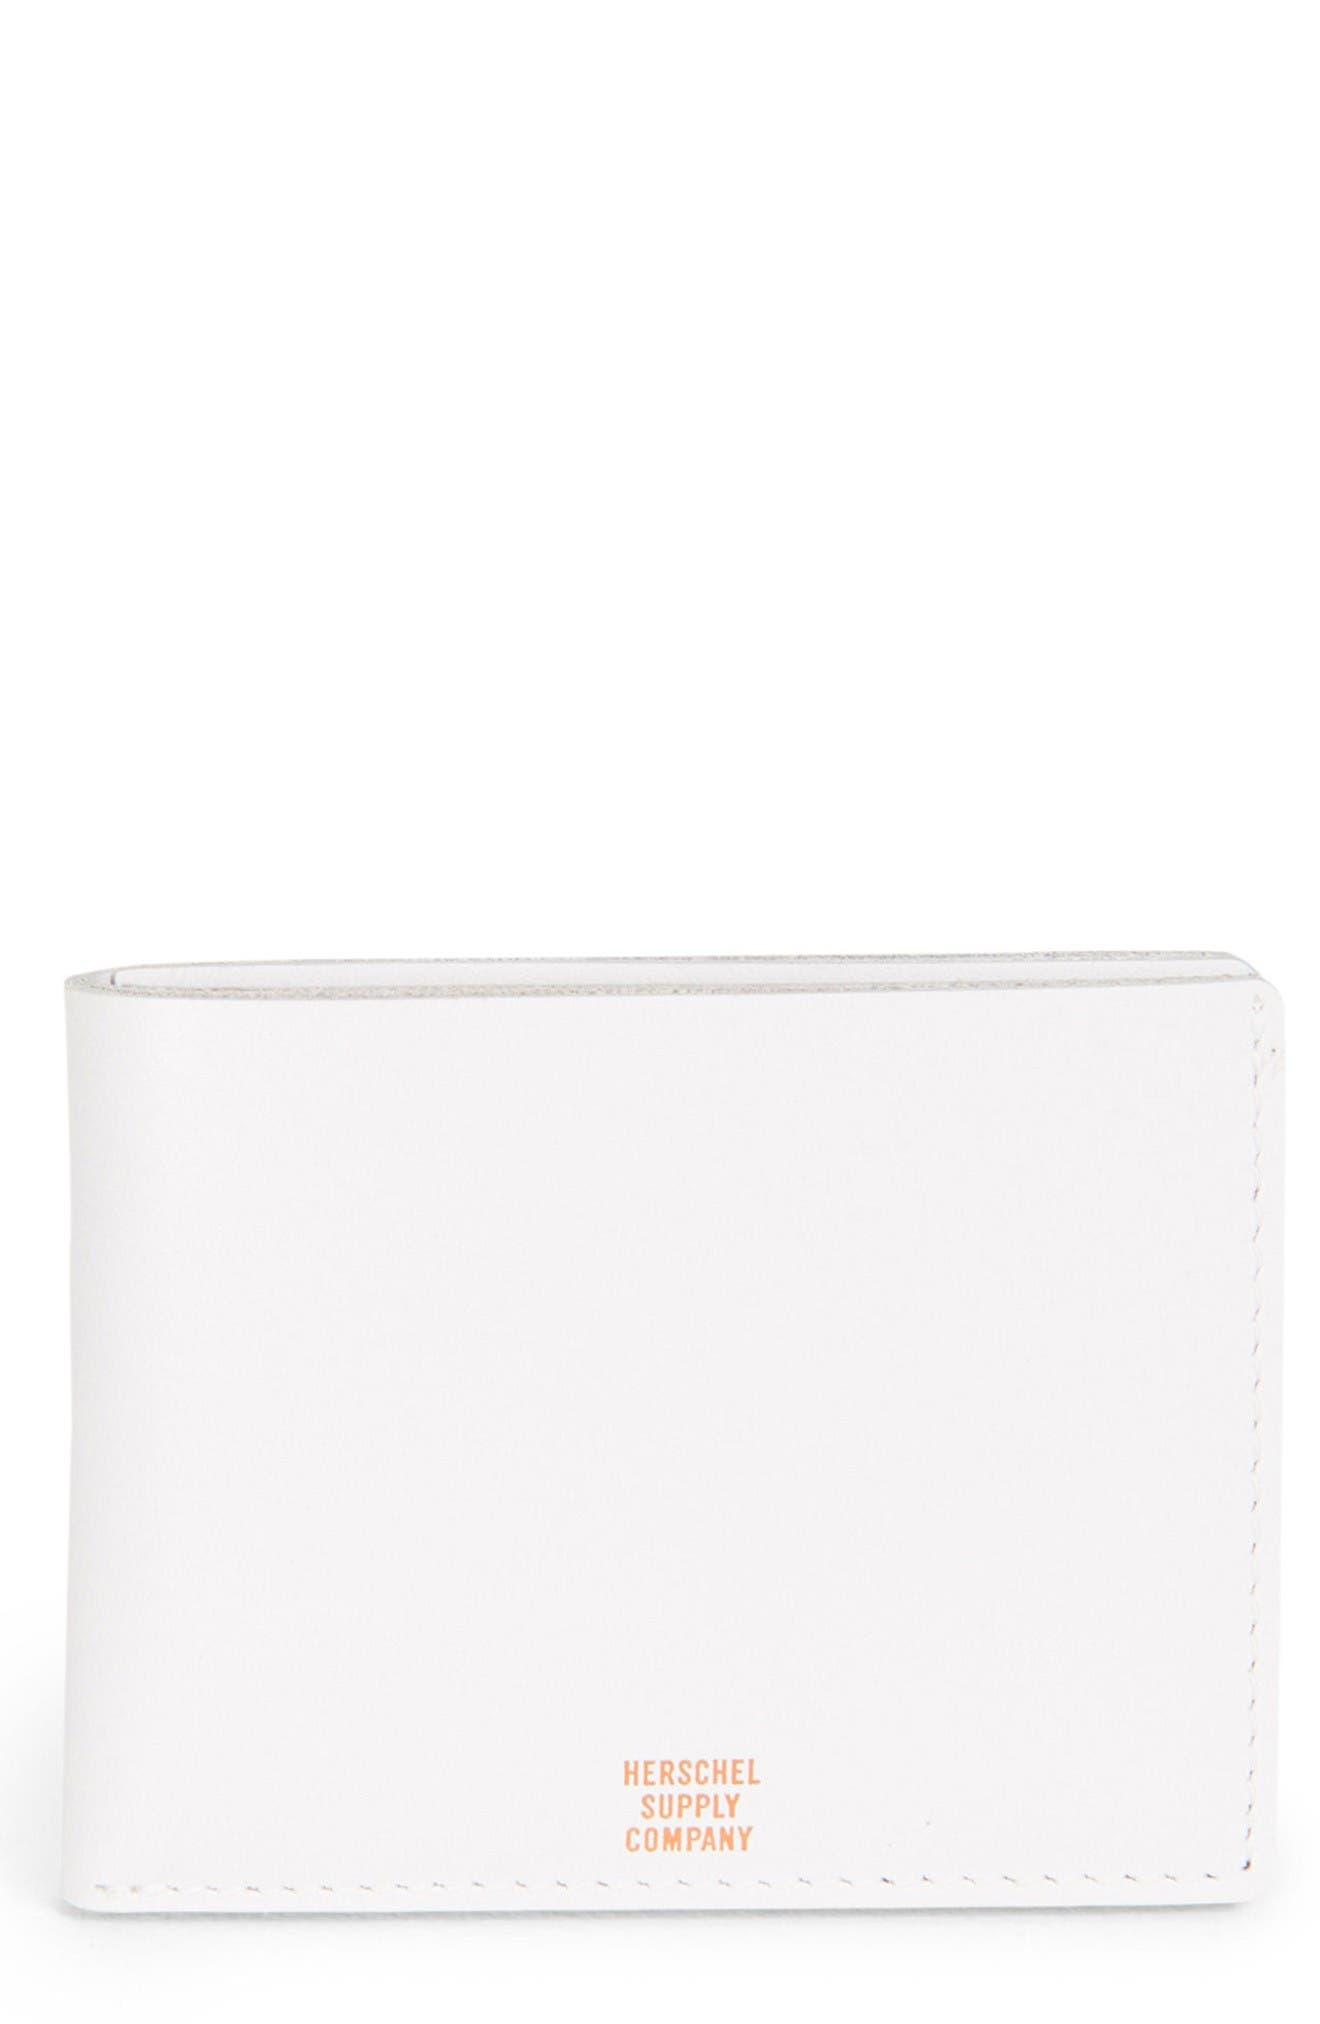 Main Image - Herschel Supply Co. Miles Leather Wallet